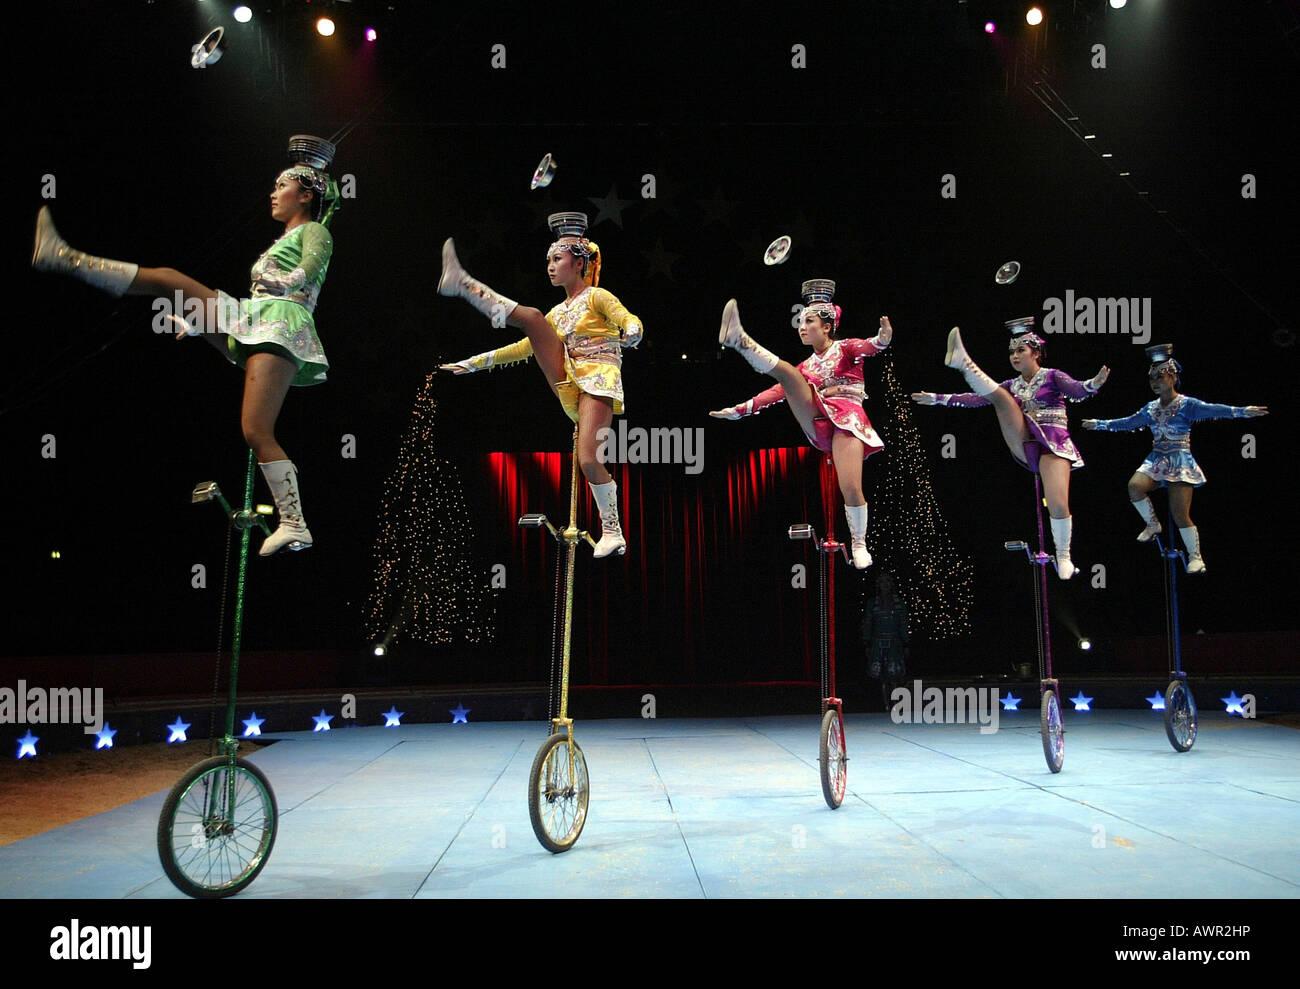 Five chinese artists juggle on unicycles. Stuttgart, Baden-Wuerttemberg, Germany. - Stock Image